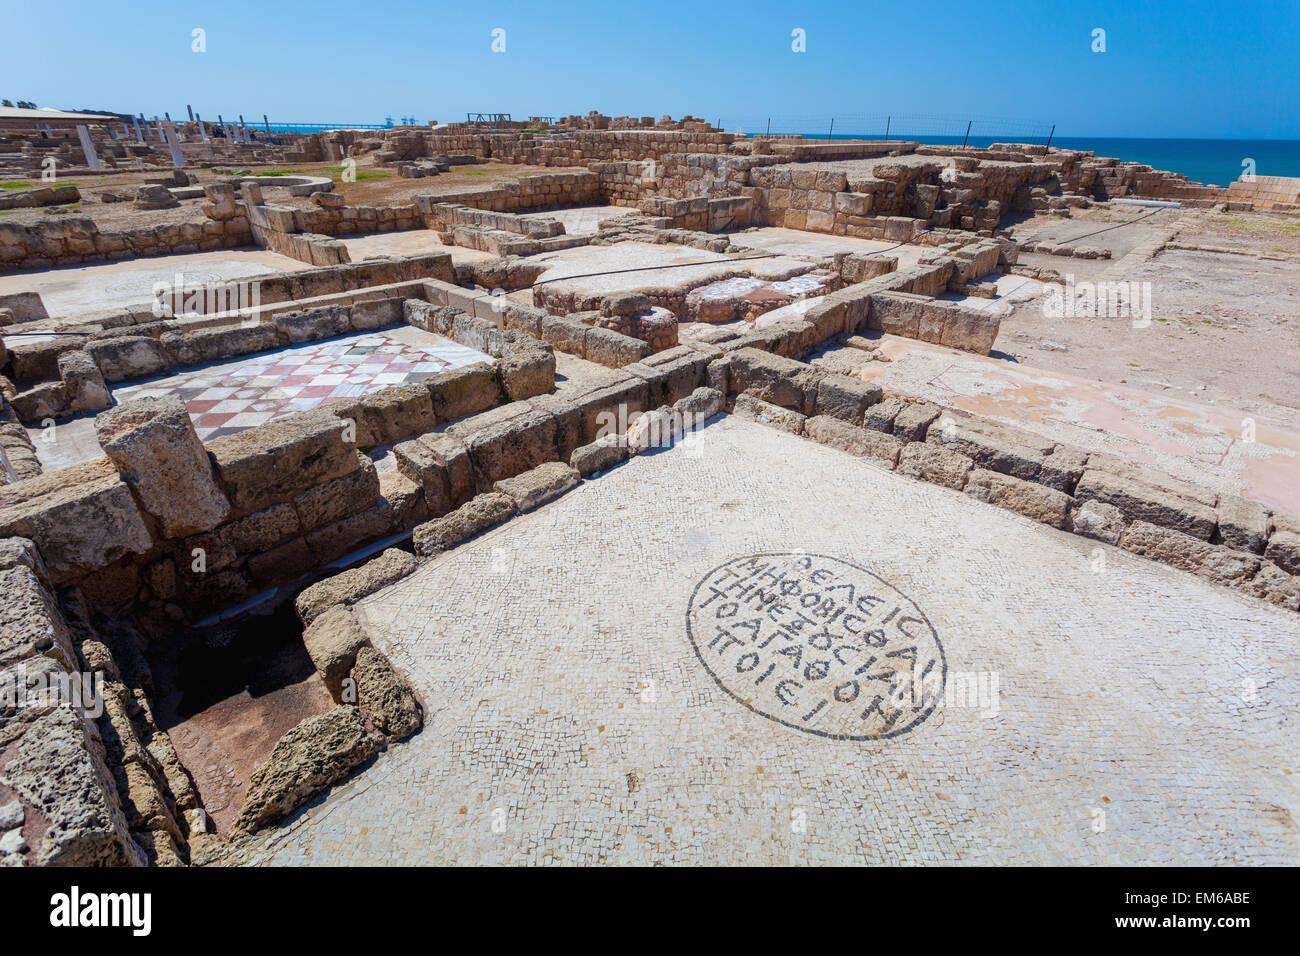 Mediterranean,Greek Language,Language,Cityscape - Stock Image